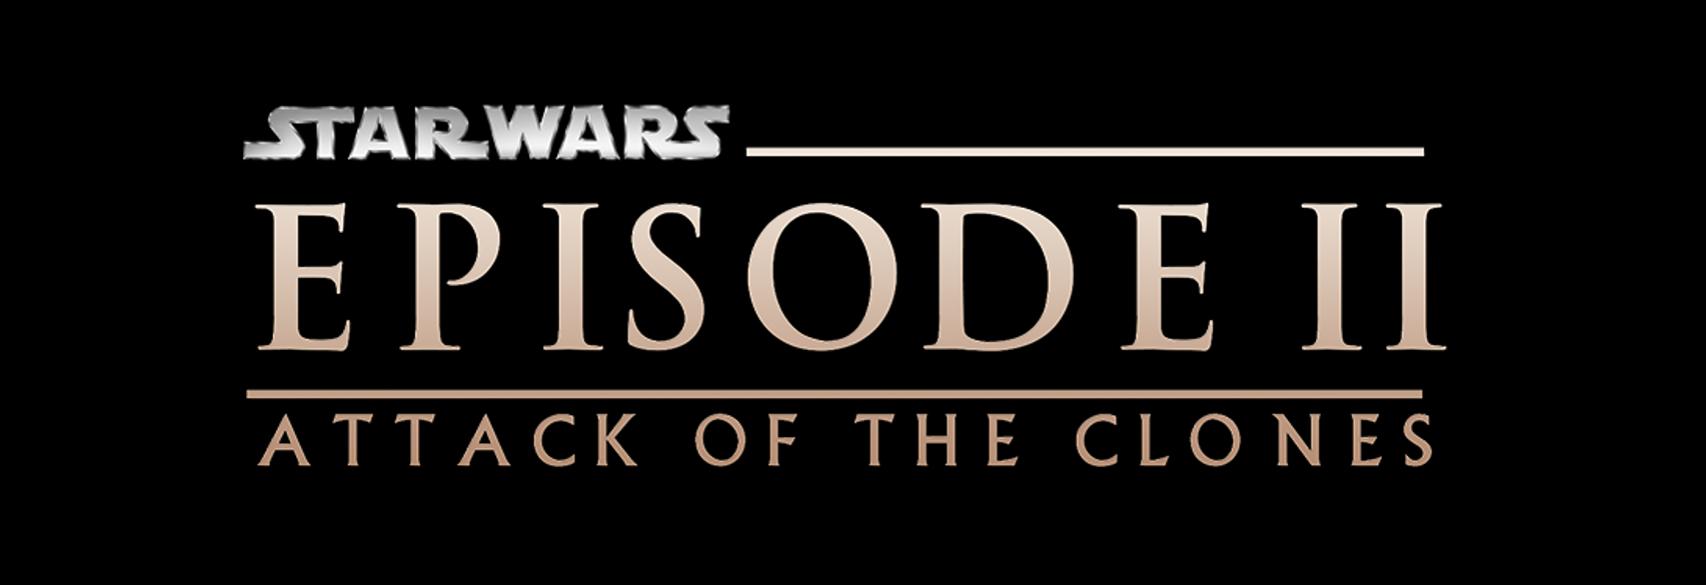 Star Wars Retrospective: Attack of the Clones – Alex Moreland | Writer